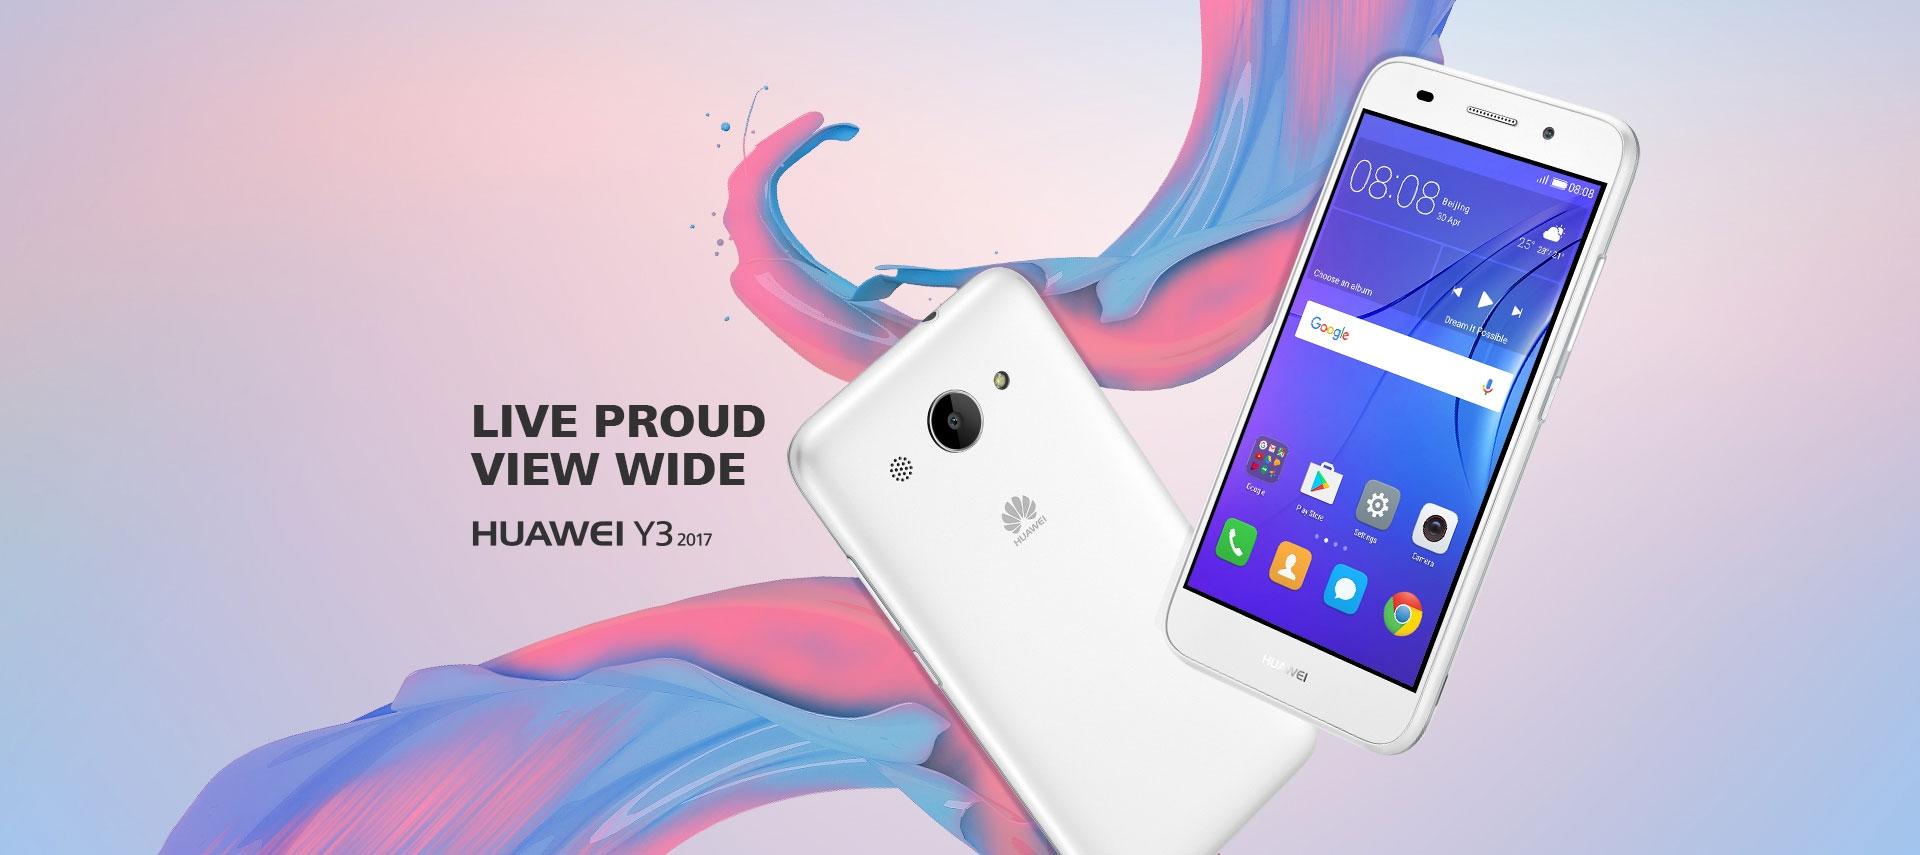 Huawei Y3 2017 in Bangladesh